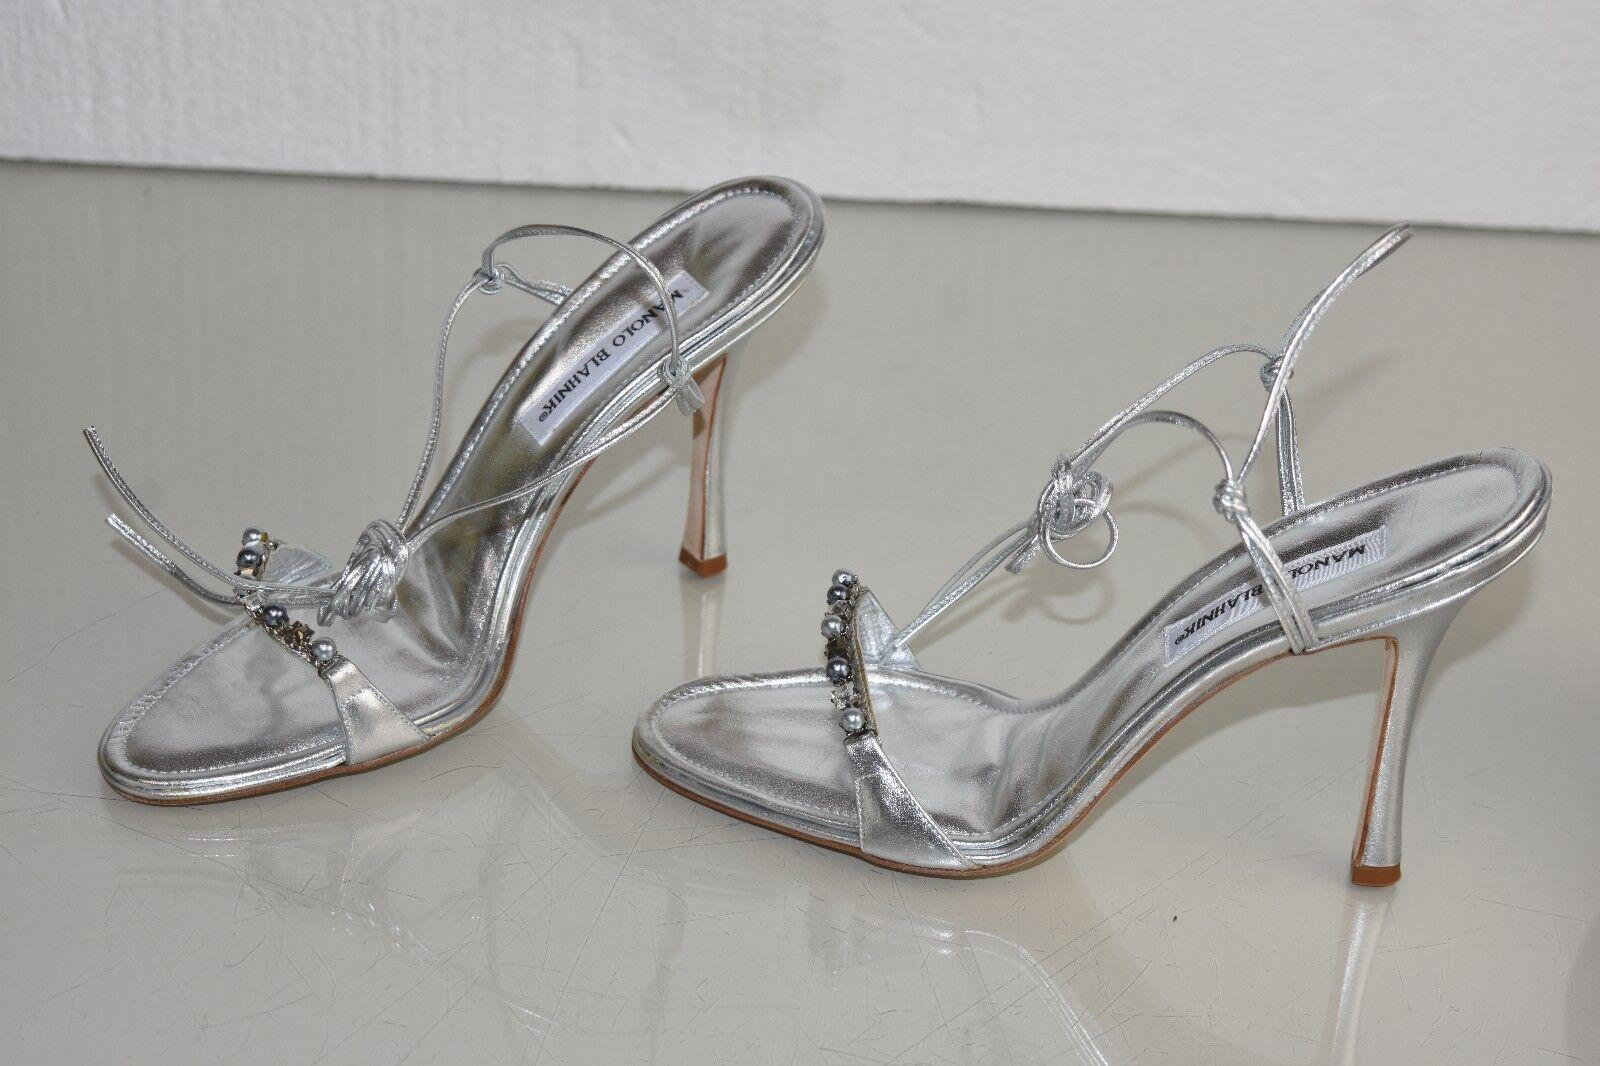 1595 NEW Manolo Blahnik BAIXA Sandals Silver CRYSTALS PEARLS Wedding shoes 40.5